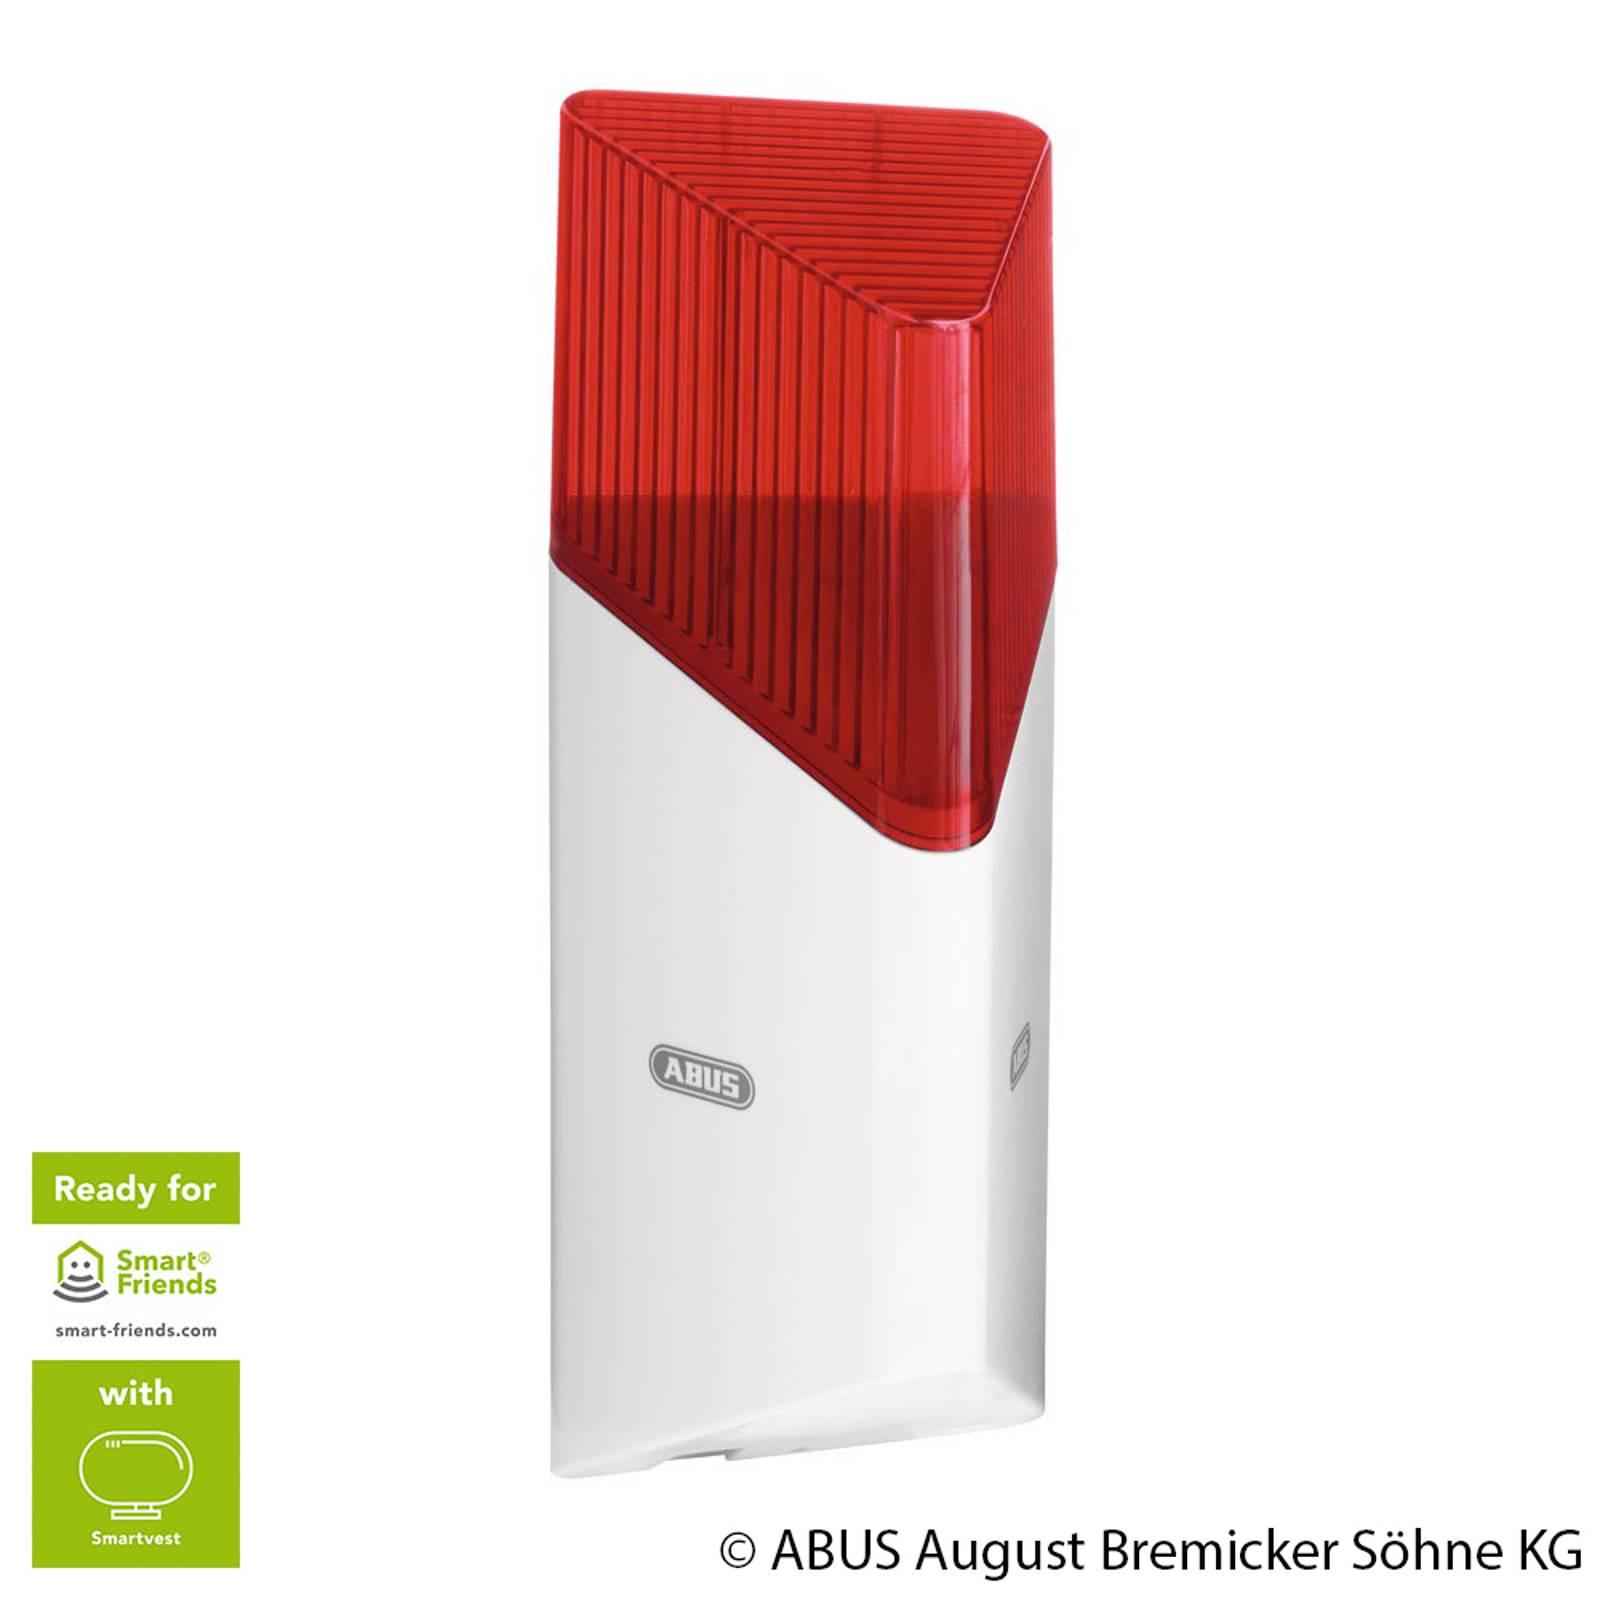 ABUS Smartvest radiosirena da interni/esterni